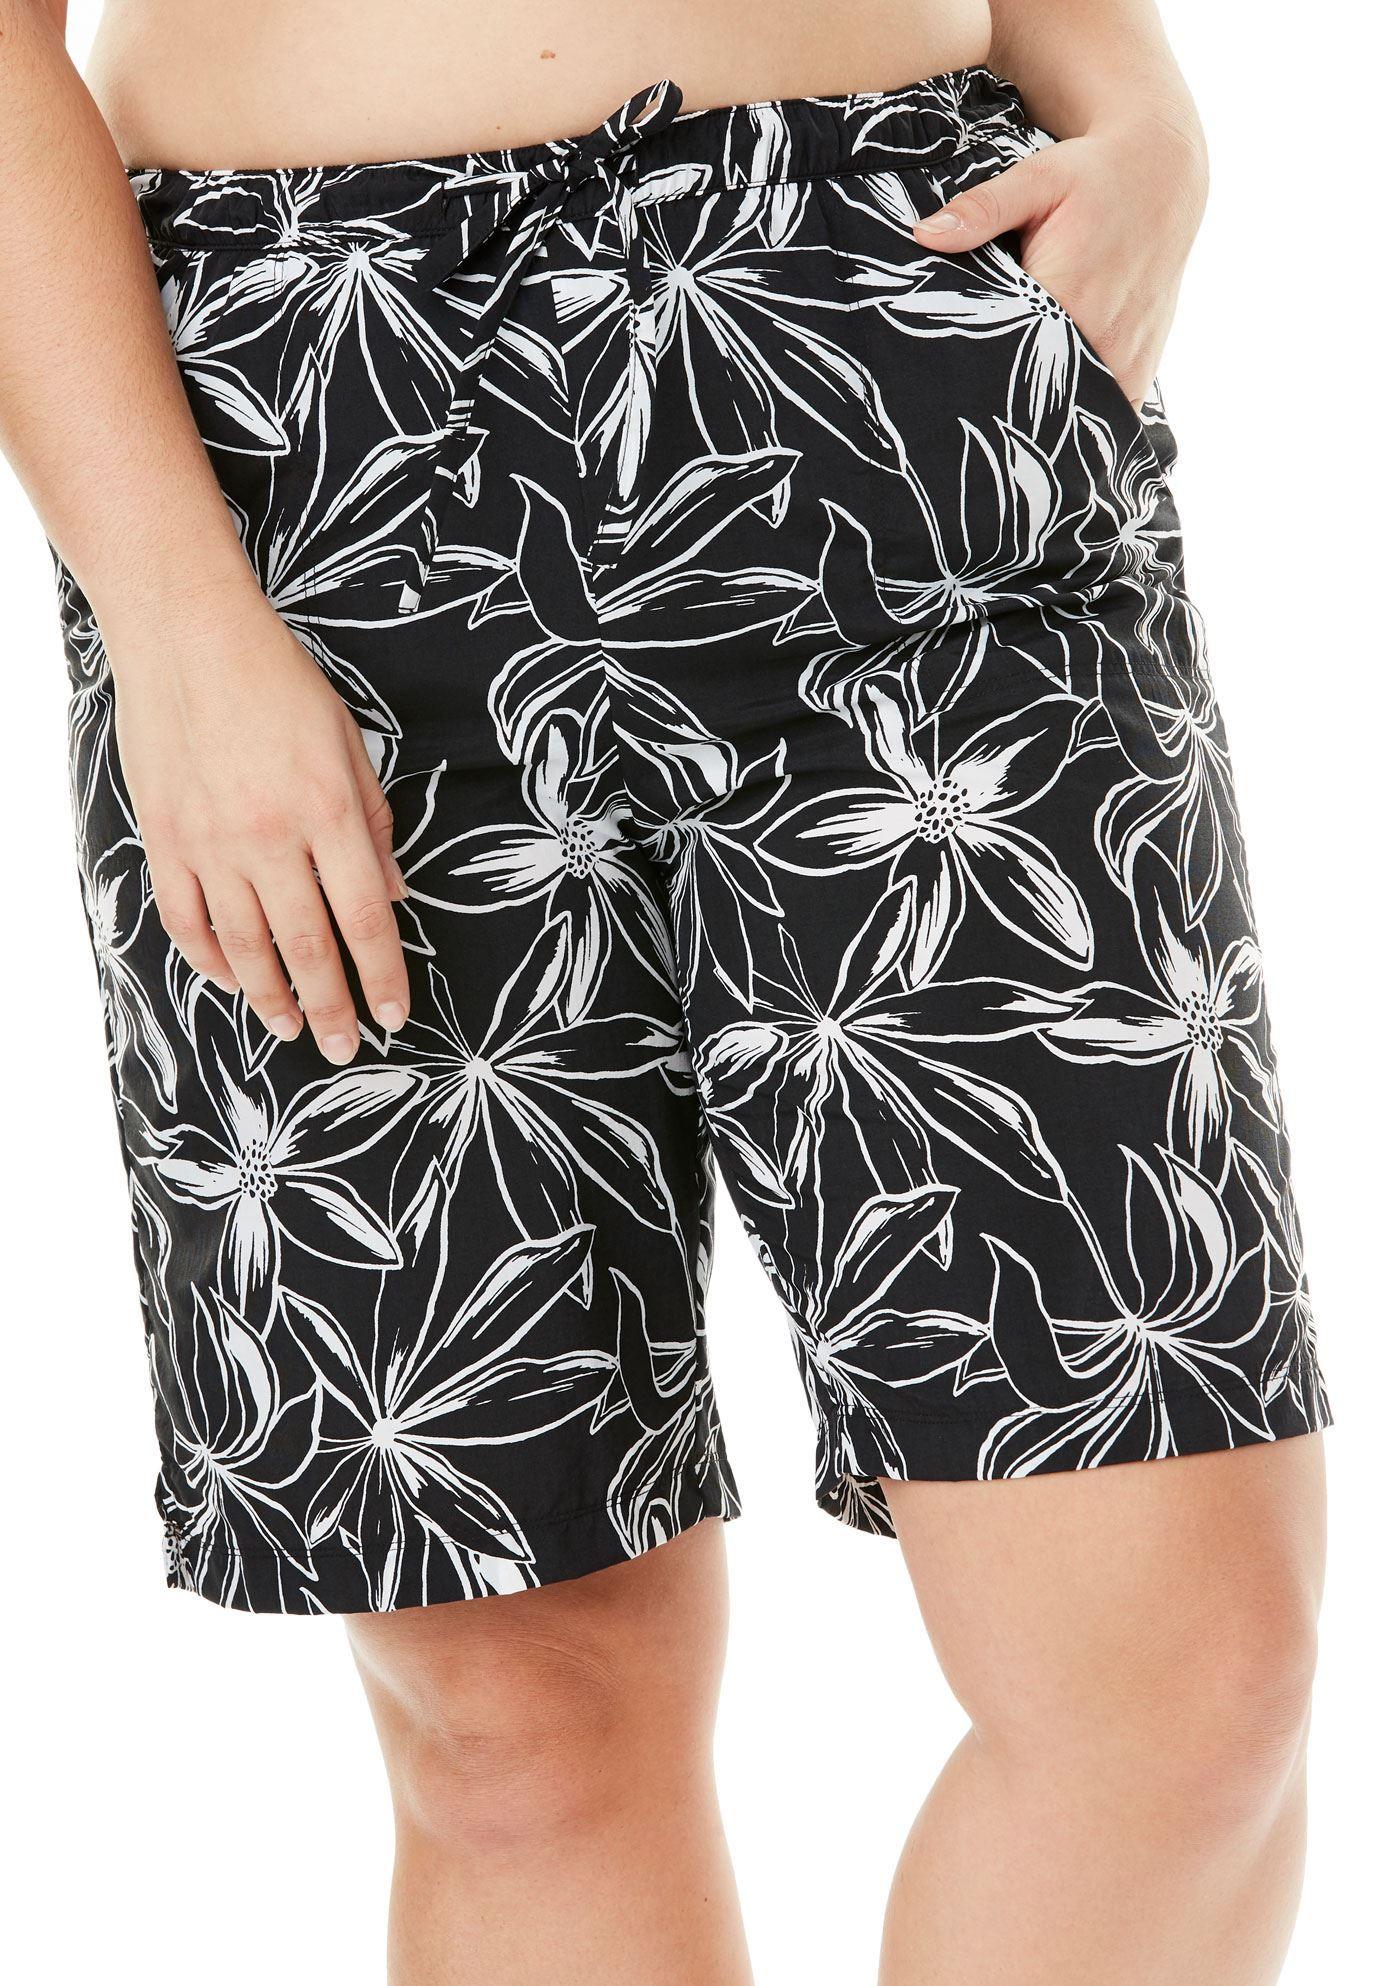 f88dae47d1b83 Long Taslon Board Shorts by Swim 365 - Women s Plus Size Clothing ...